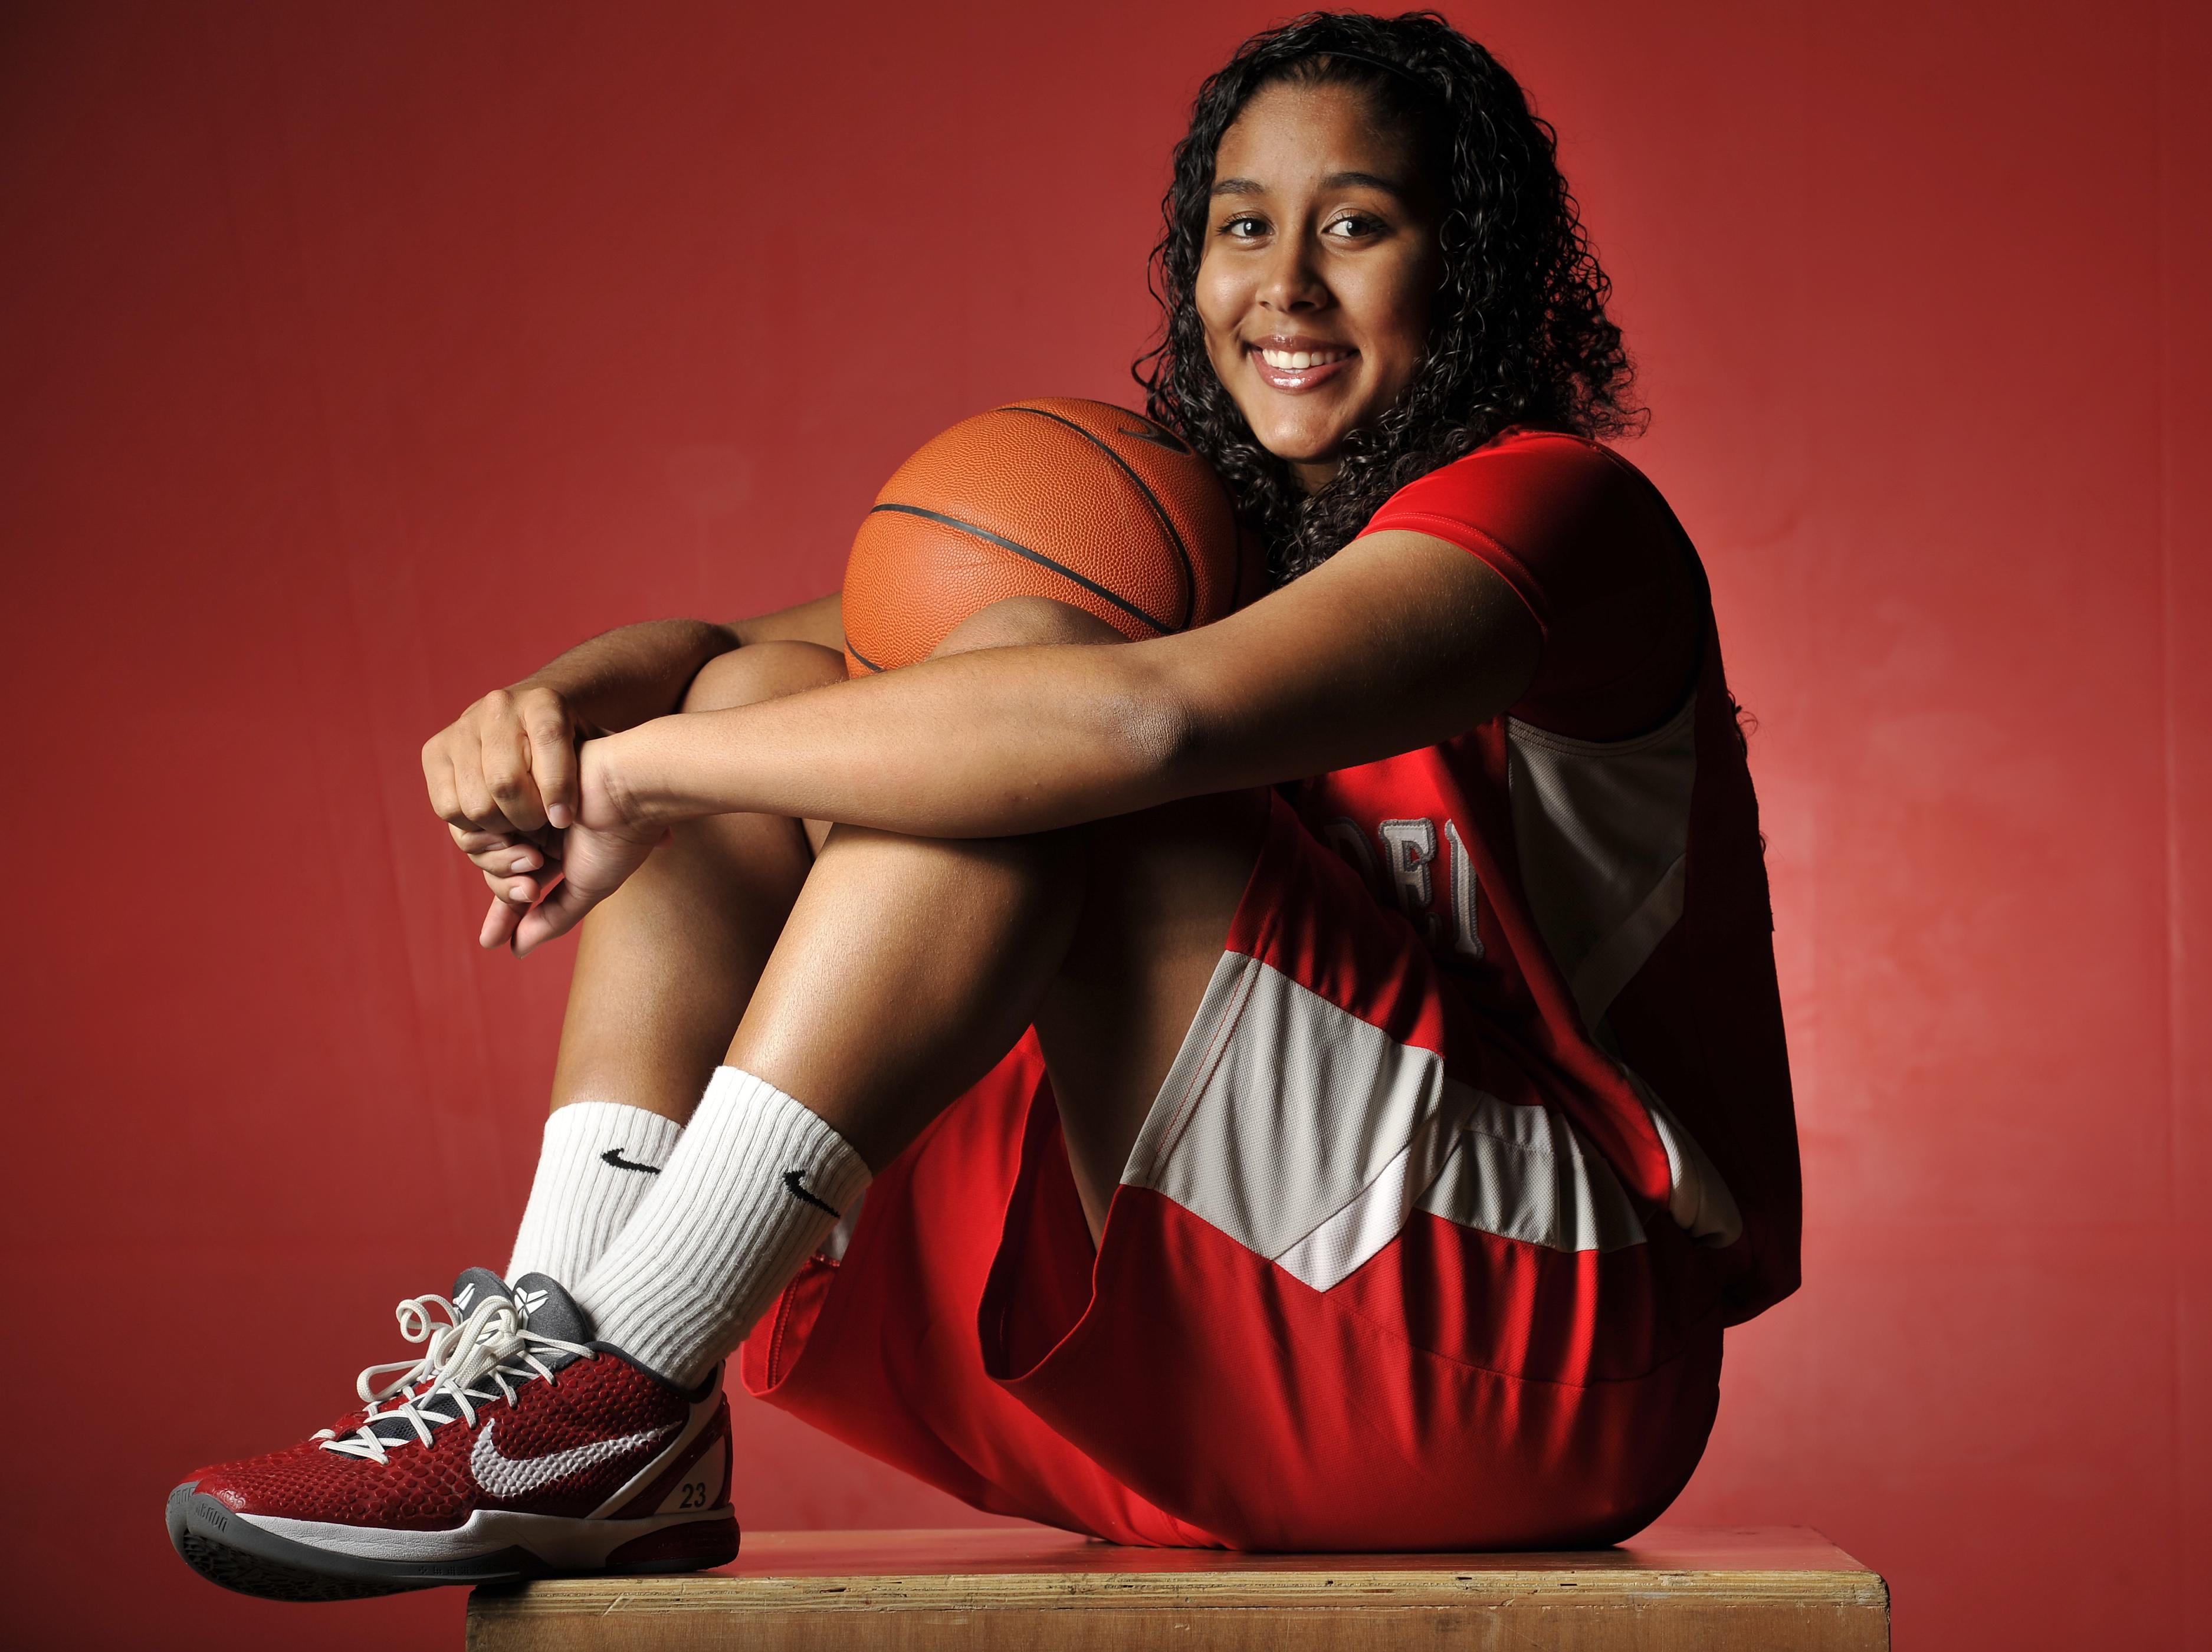 Kaleena Mosqueda-Lewis of Mater Dei was the ALL-USA Girls Basketball Player of the Year in 2011 (Photo: Robert Hanashiro, USA TODAY Sports)